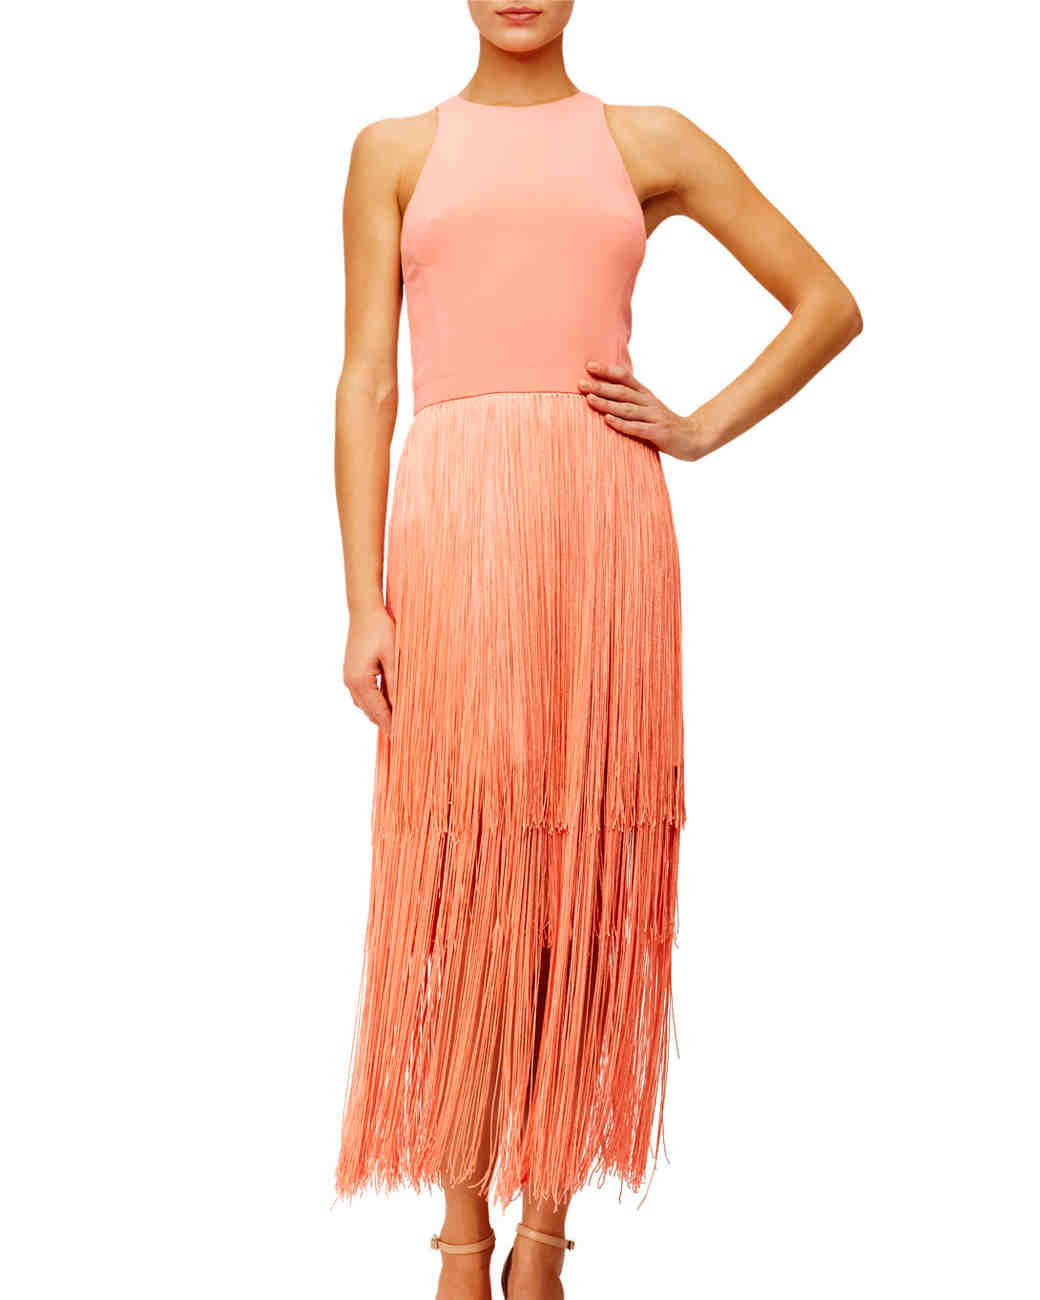 engagement-party-dresses-tamara-mellon-795-1215.jpg